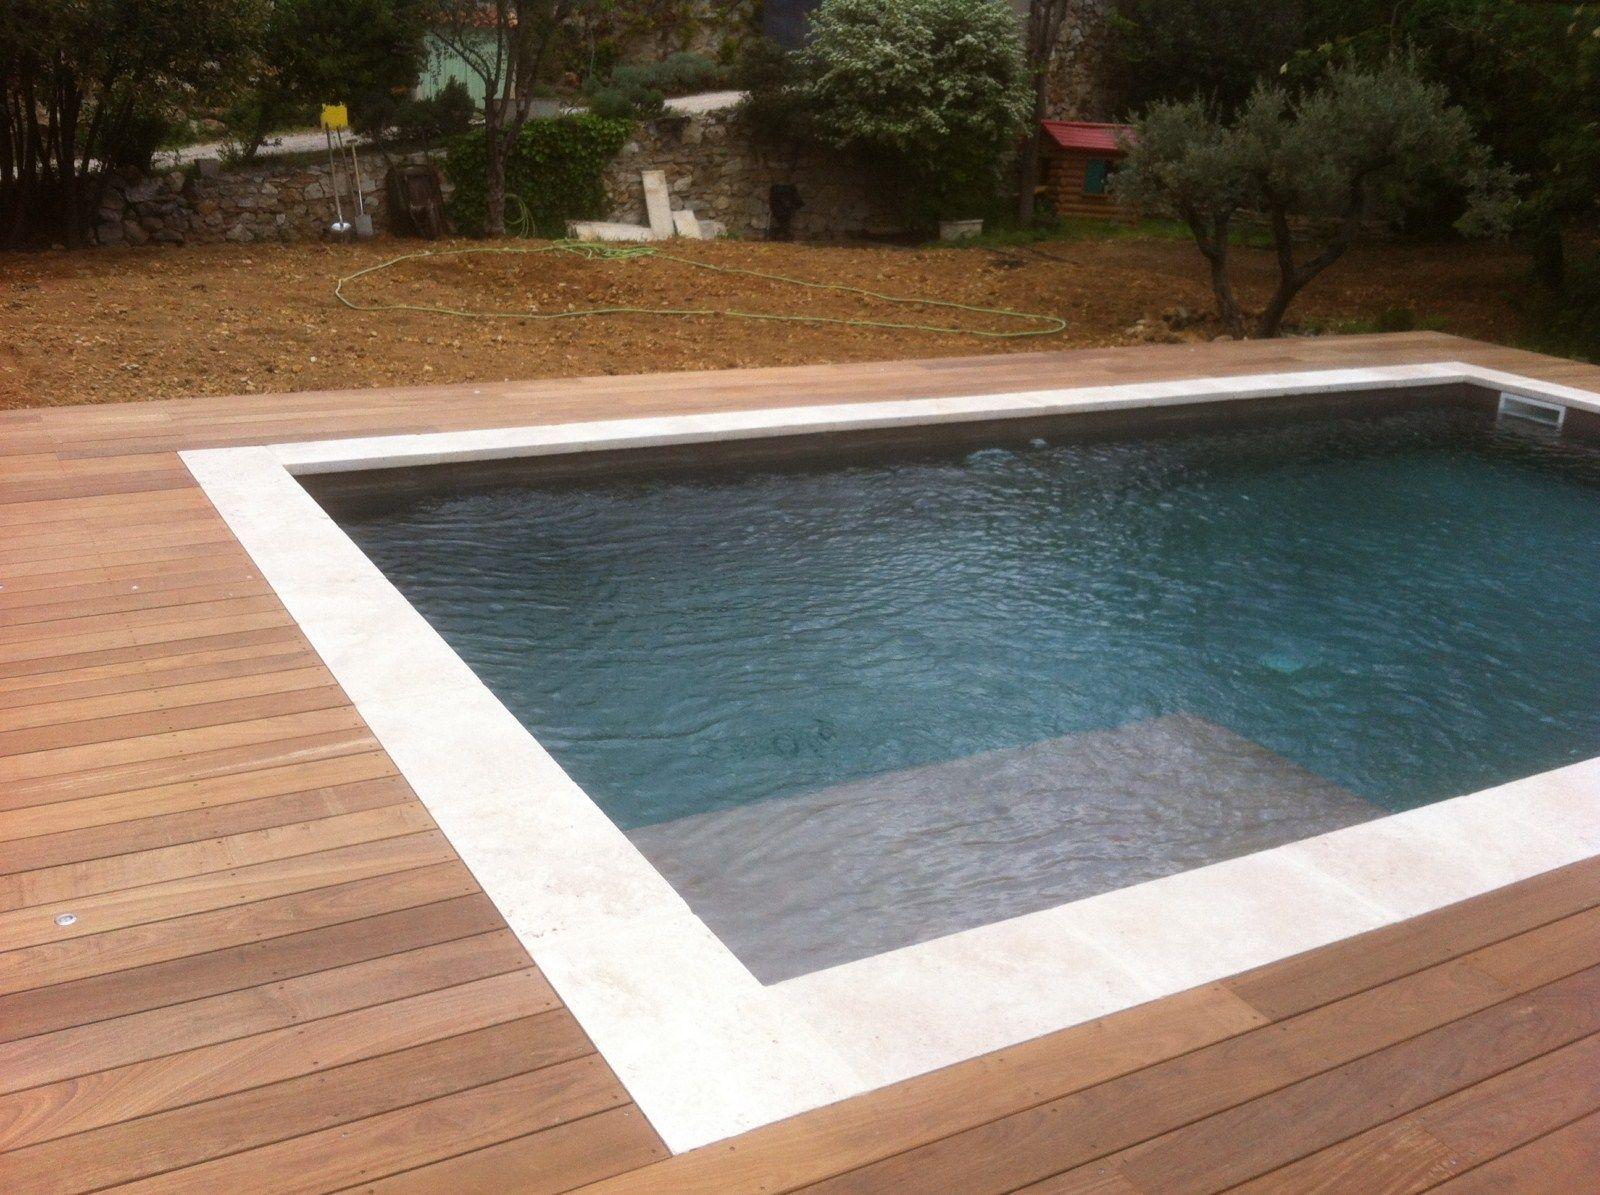 Https Www Lesterrassesdubois Com Public Img Big Tour De Piscine50912d31ee6a6 Jpg Backyard Pool Designs Decks Around Pools Deck Over Concrete